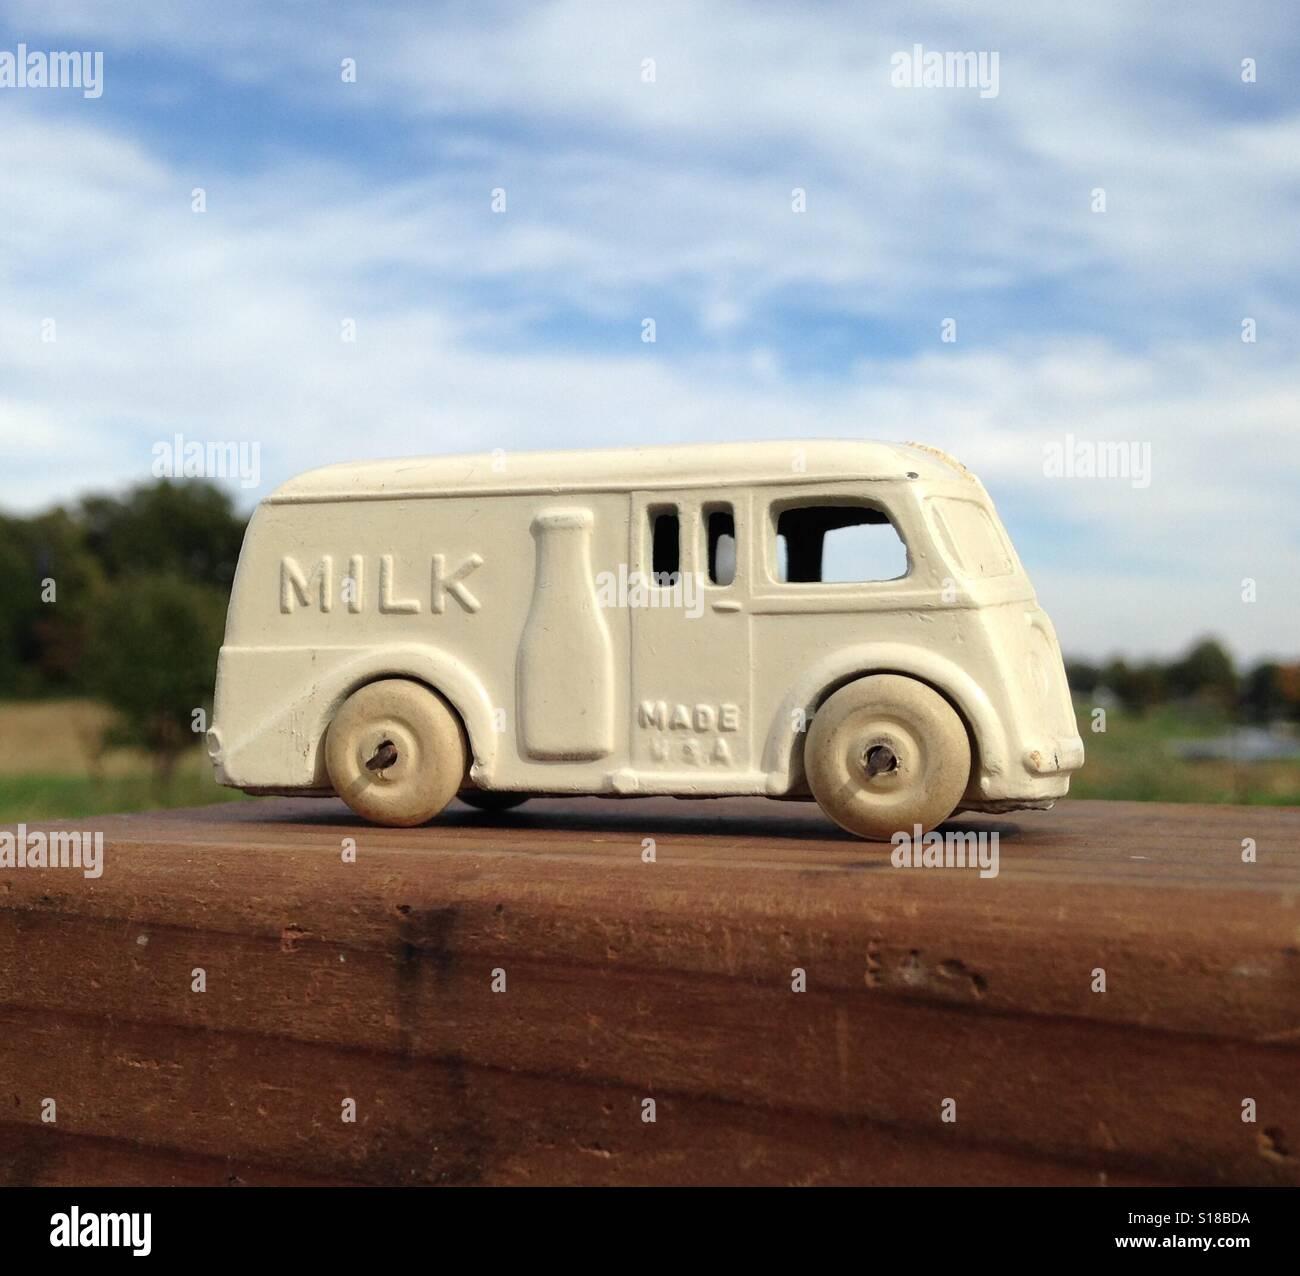 Vintage Toy Trucks Part - 49: Stock Photo - Vintage Toy Diecast Metal Milk Truck 1930s